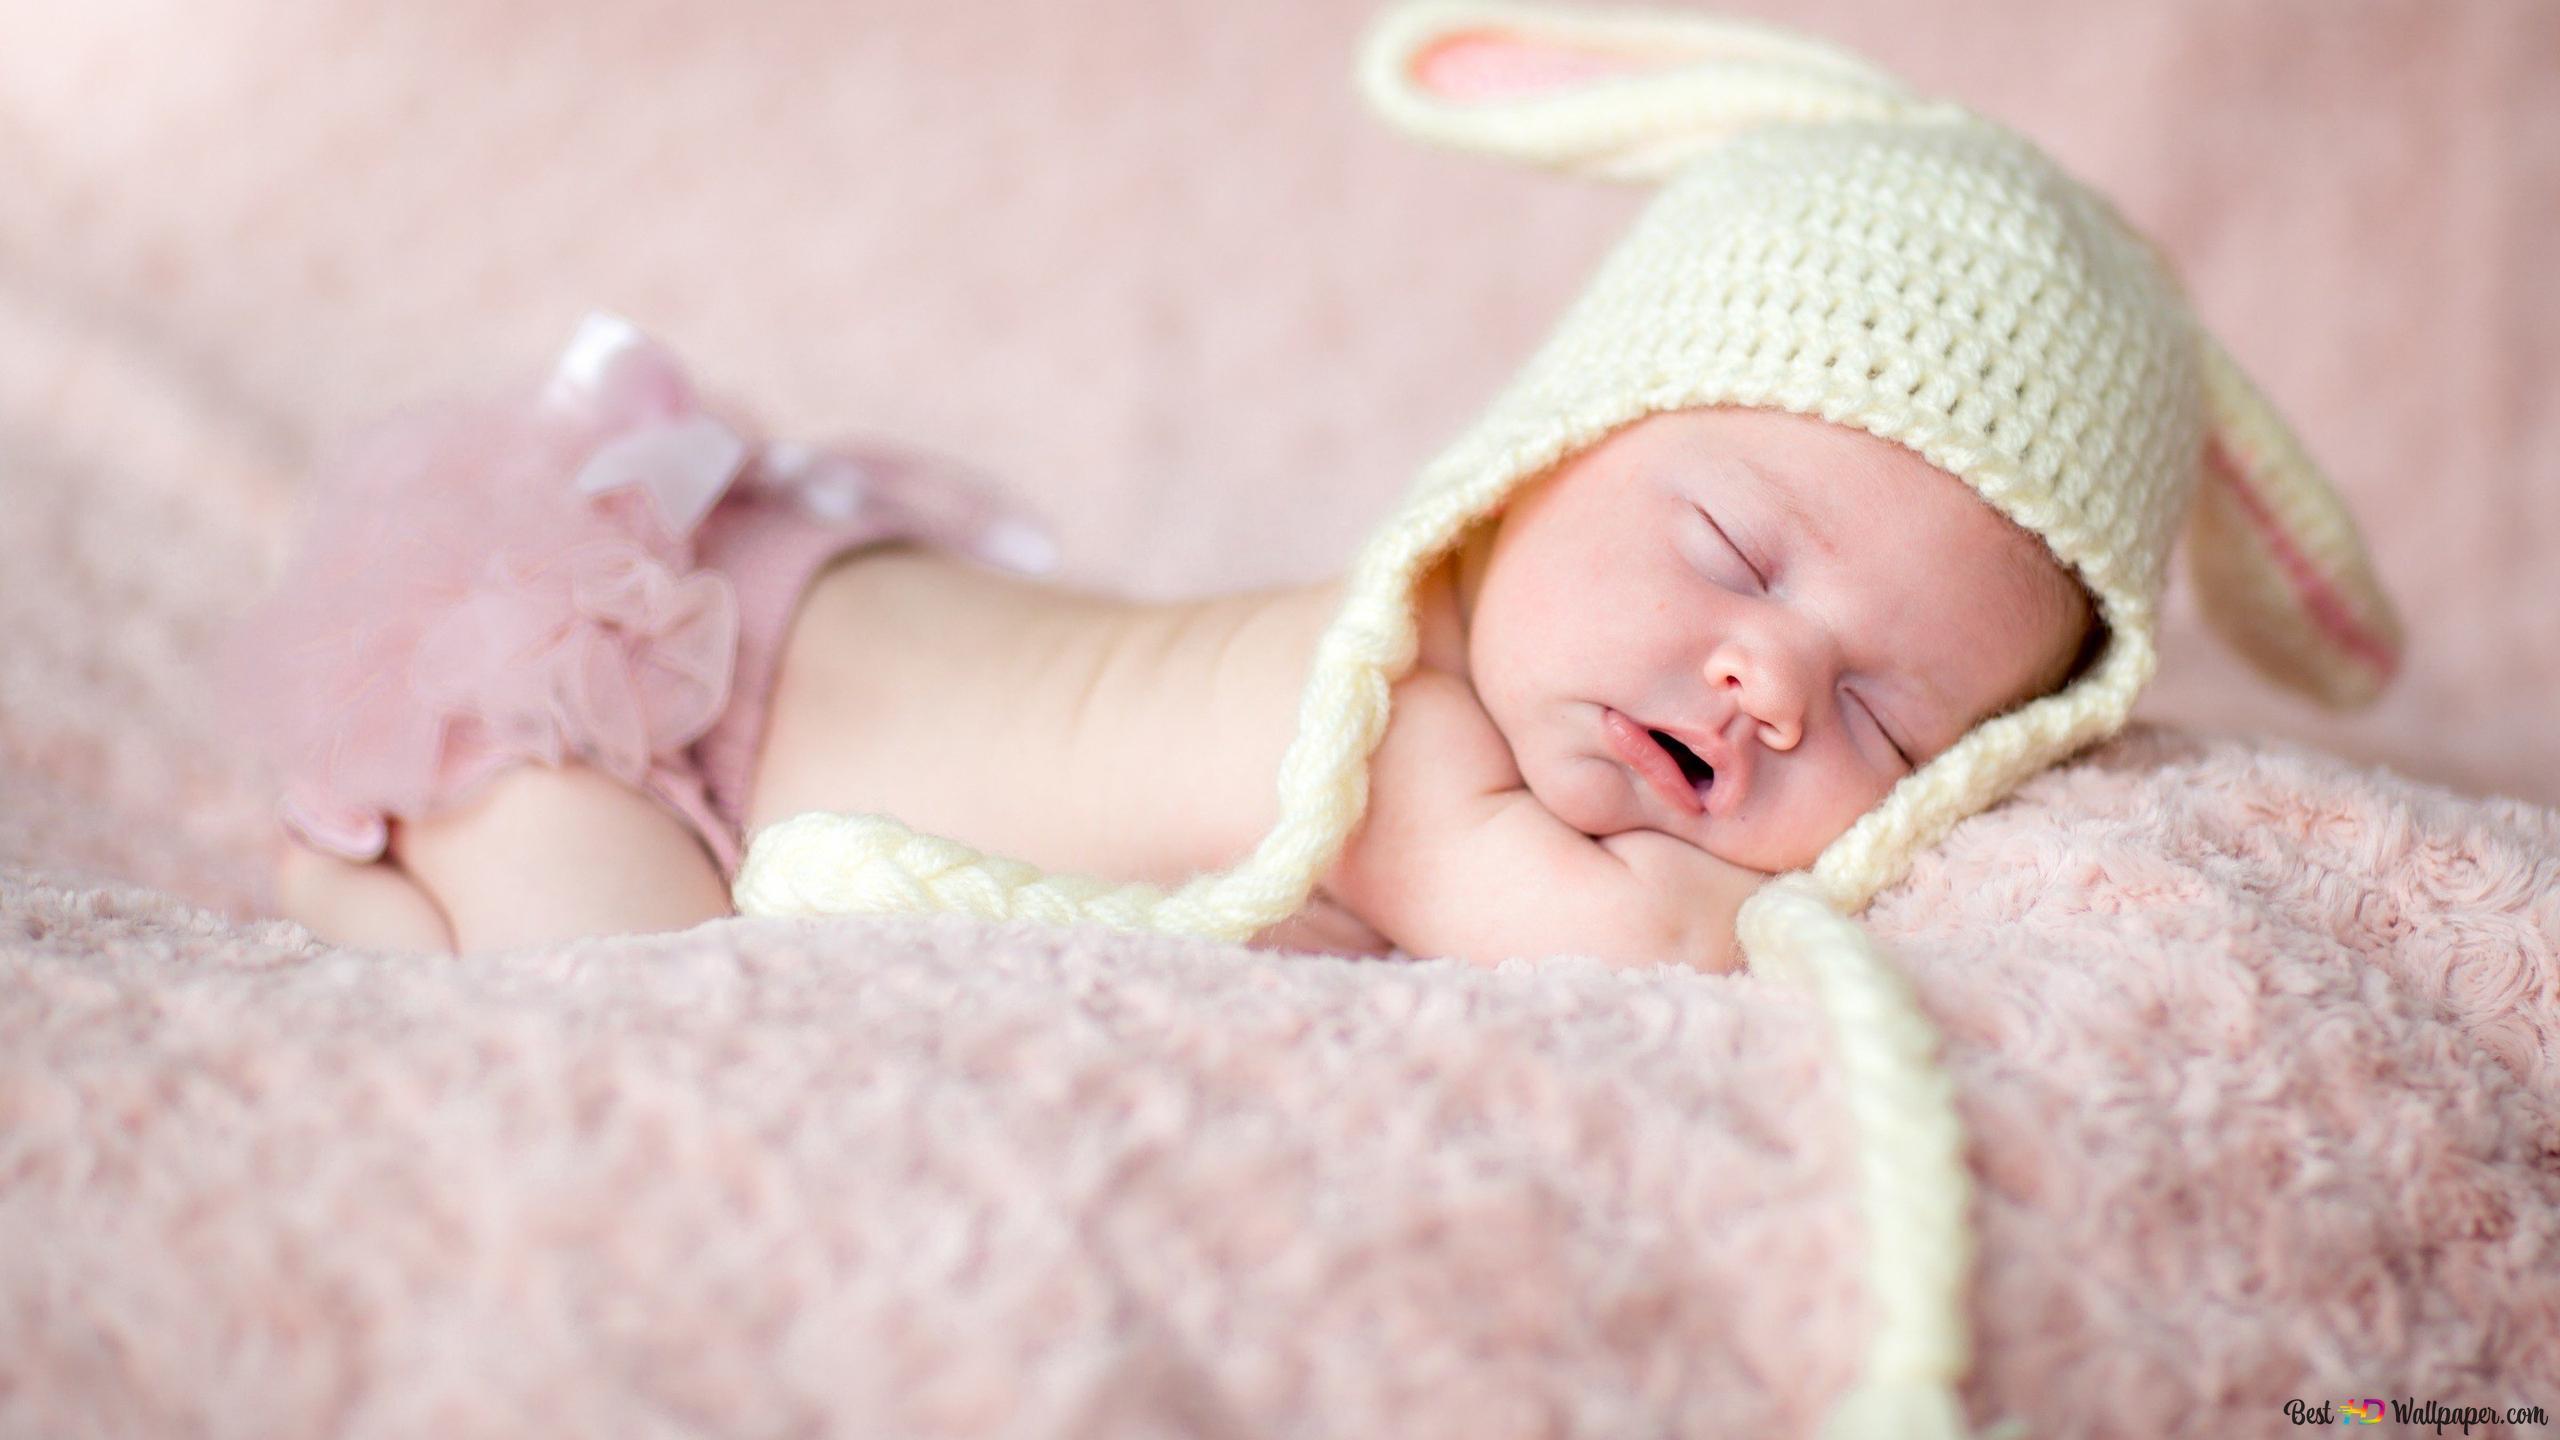 Sleeping Baby Cute Hd Wallpaper Download